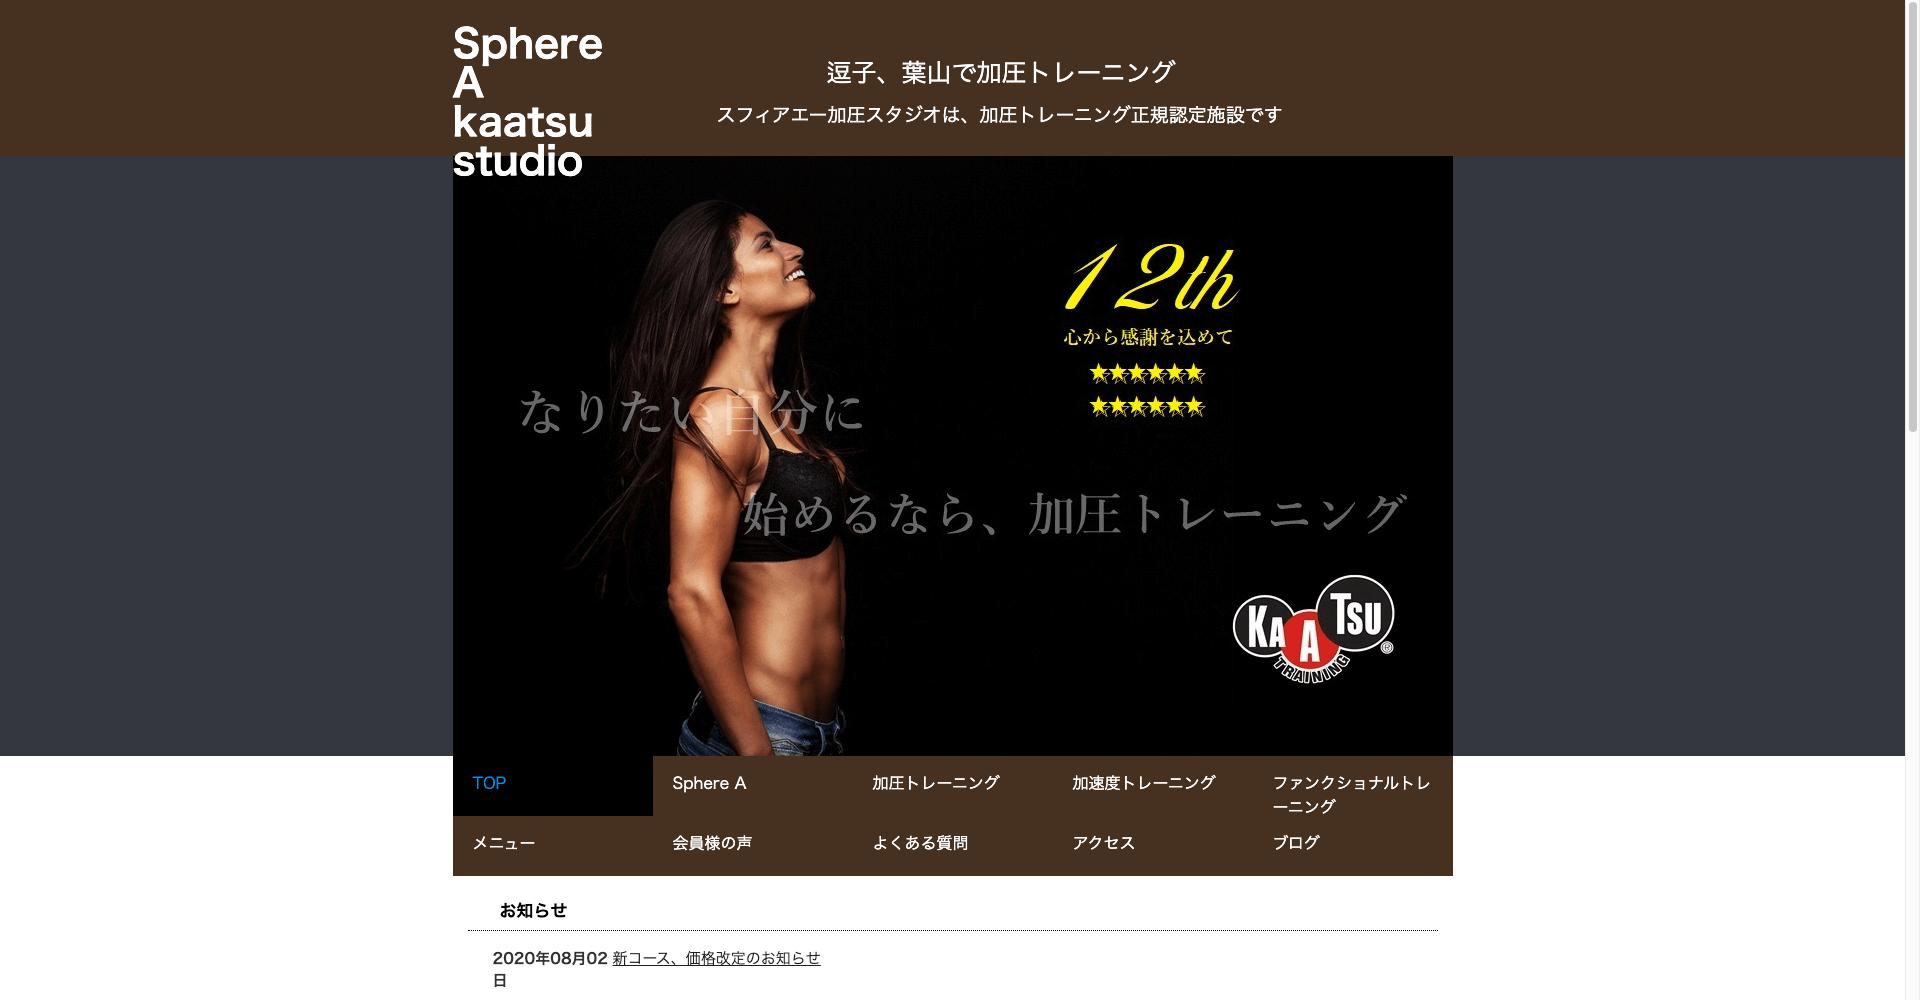 Sphere A 加圧スタジオ